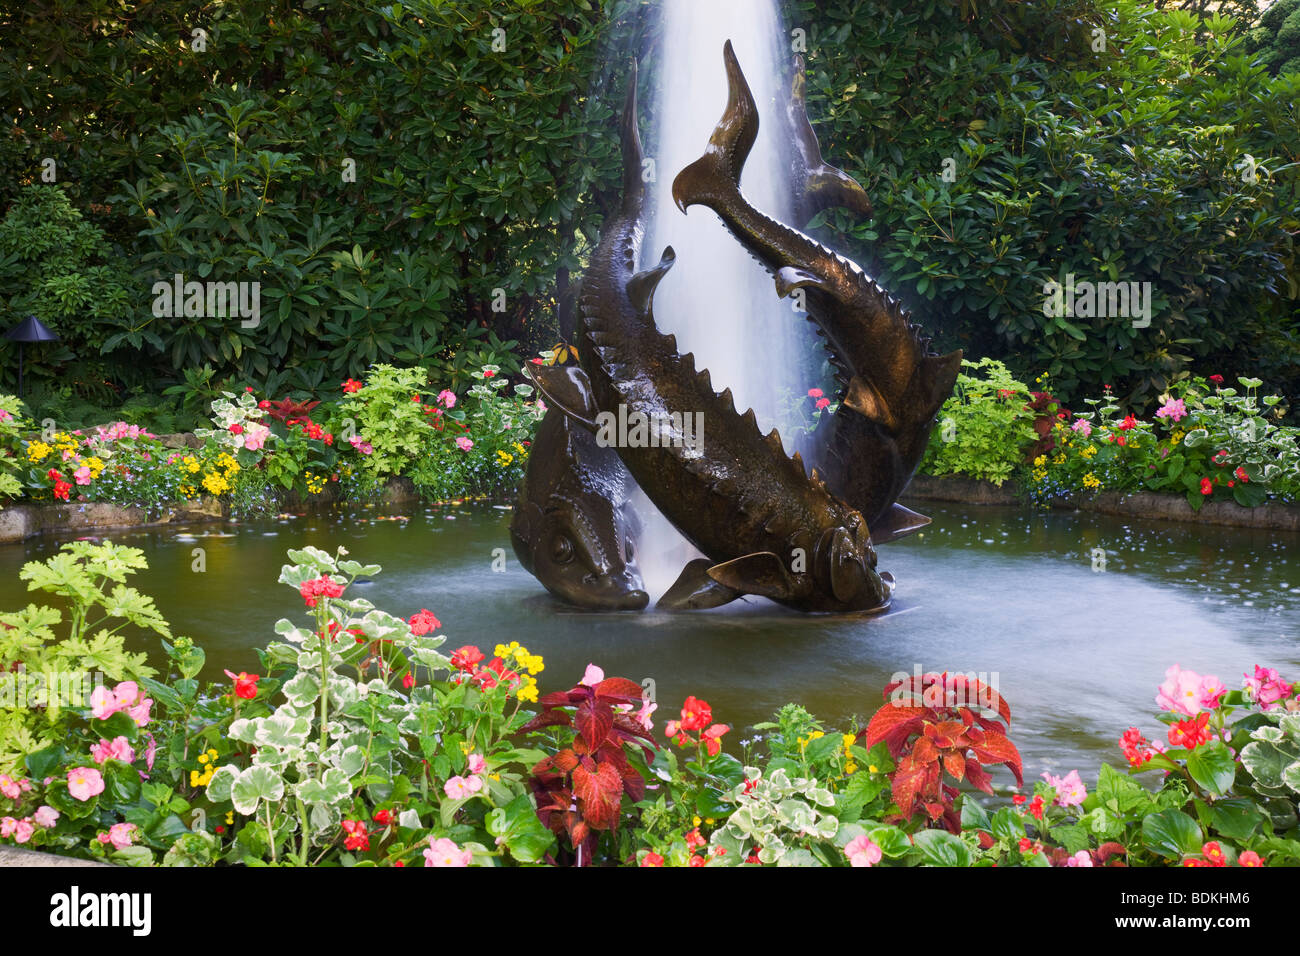 Sturgeon fountain the butchart gardens victoria vancouver island sturgeon fountain the butchart gardens victoria vancouver island british columbia canada altavistaventures Choice Image